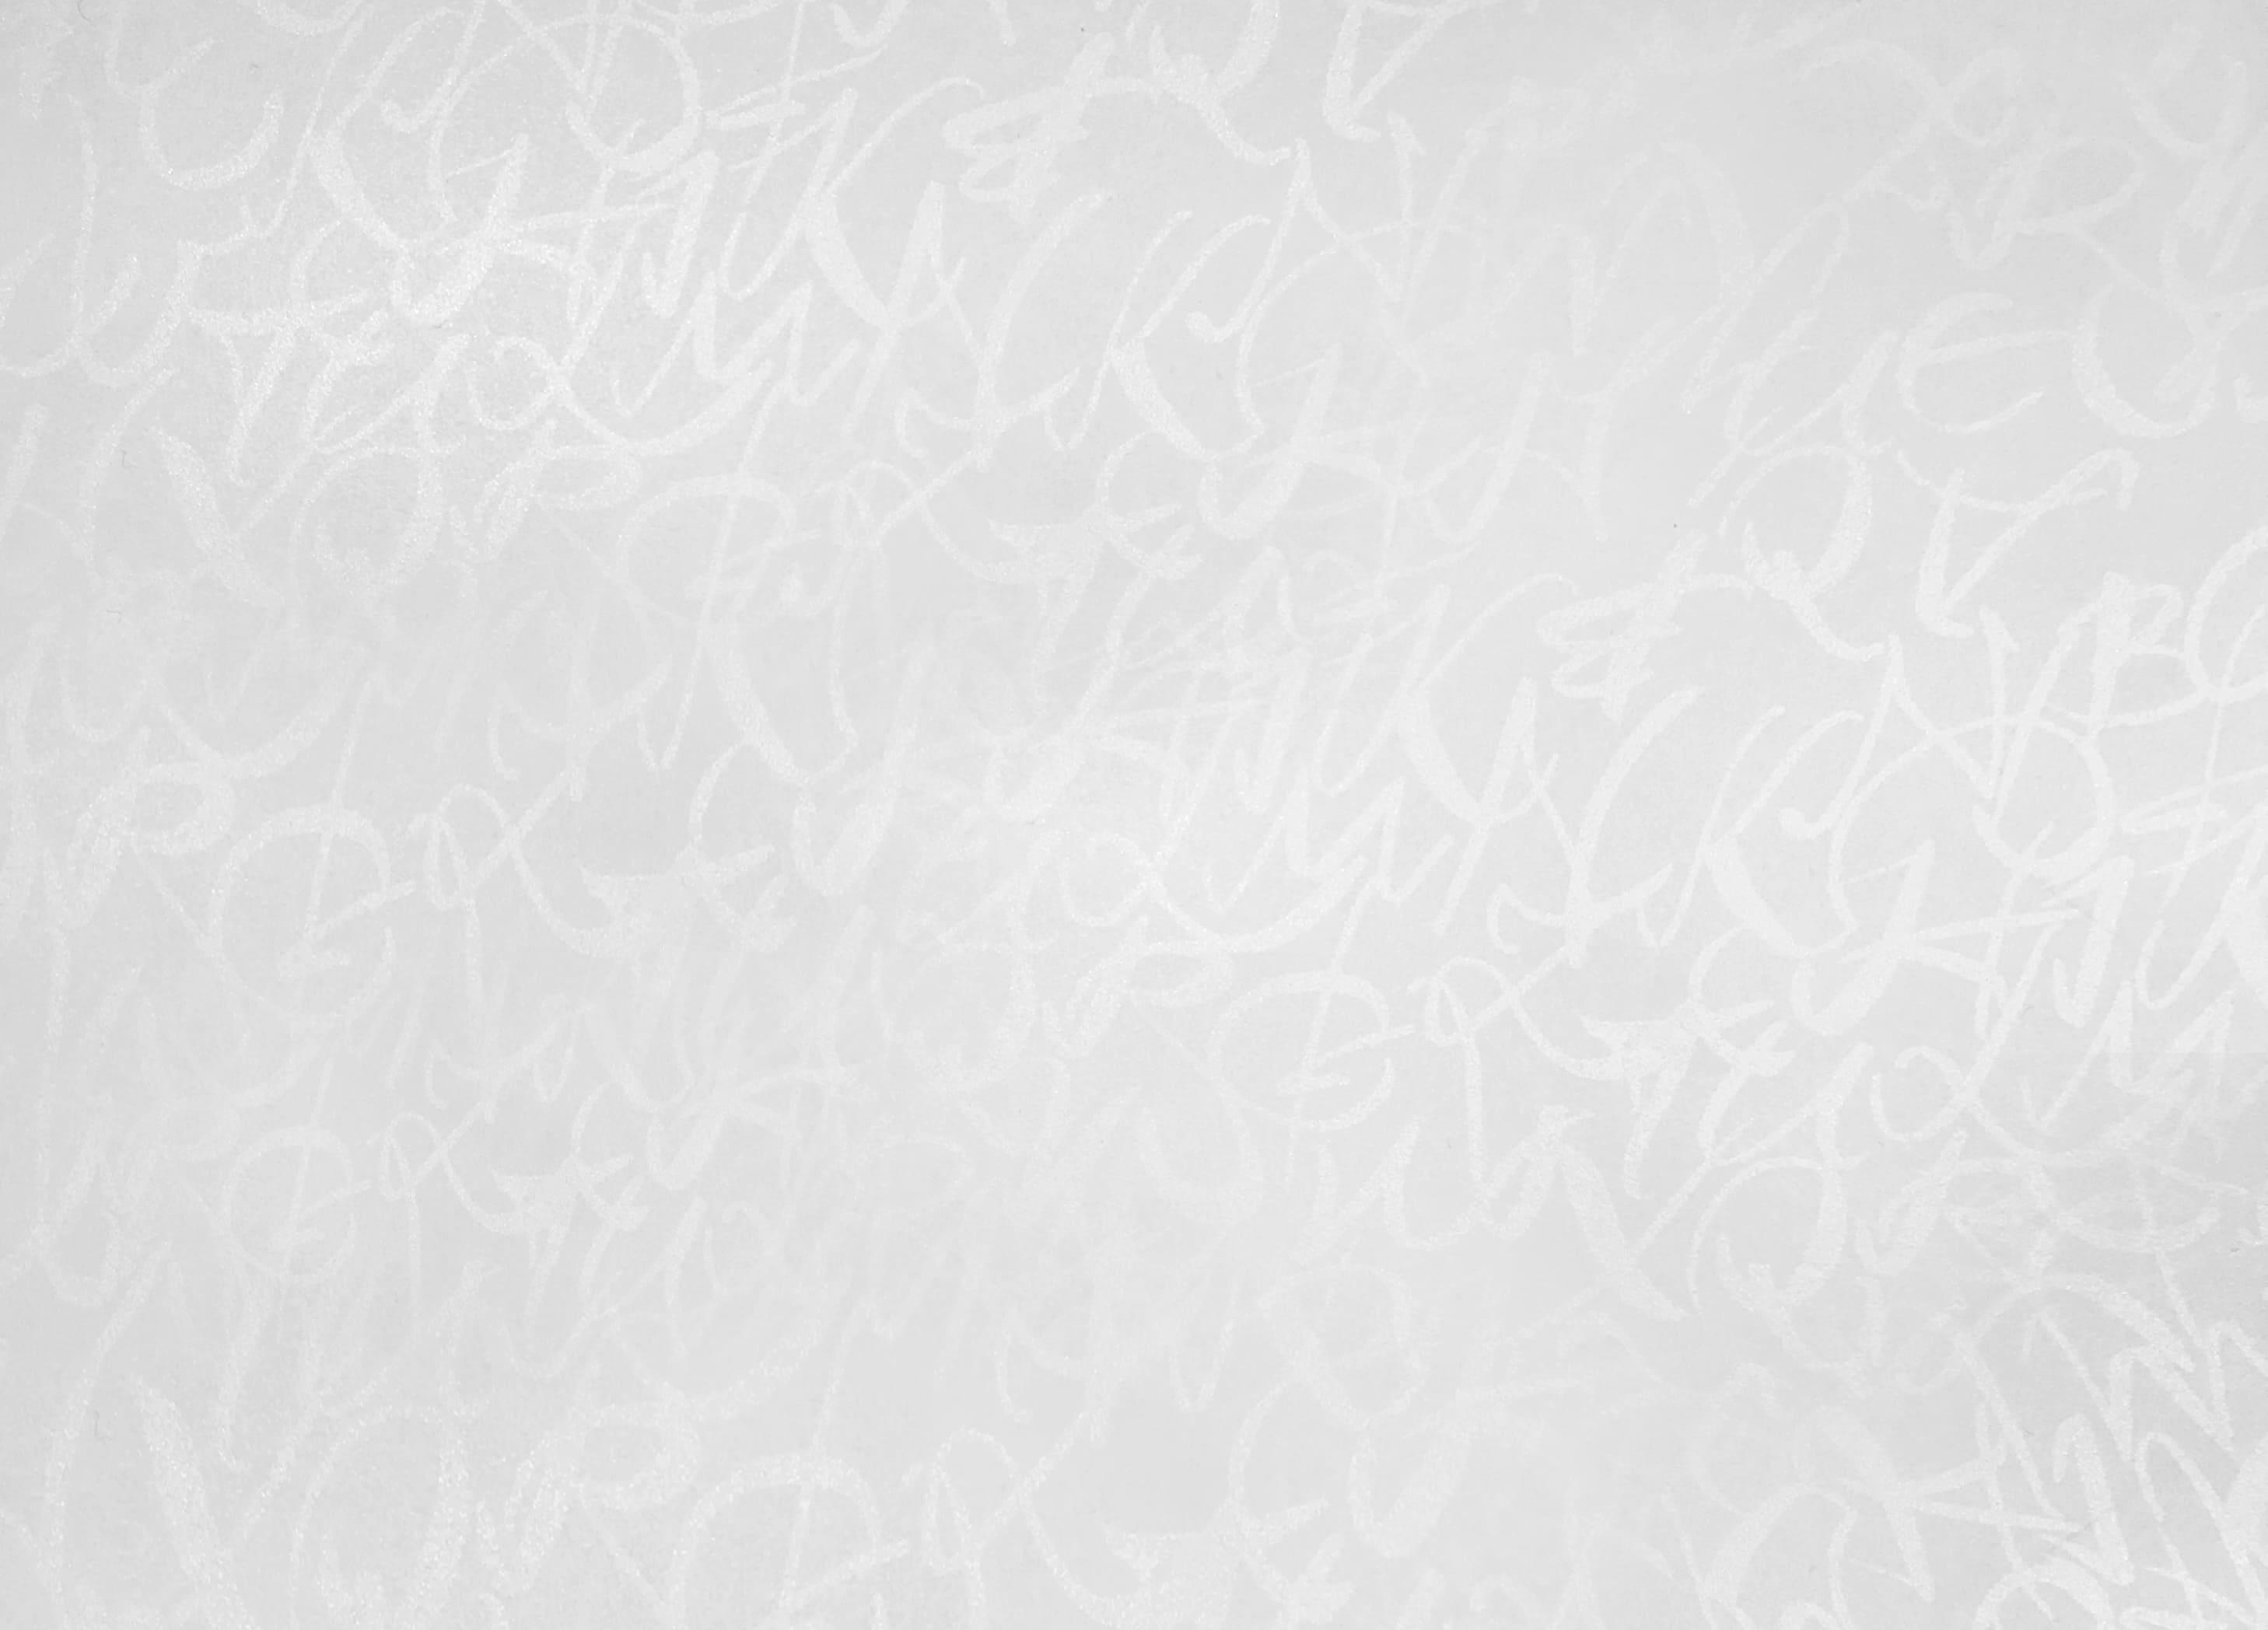 Столешница № 801 Латиница белая /38 мм